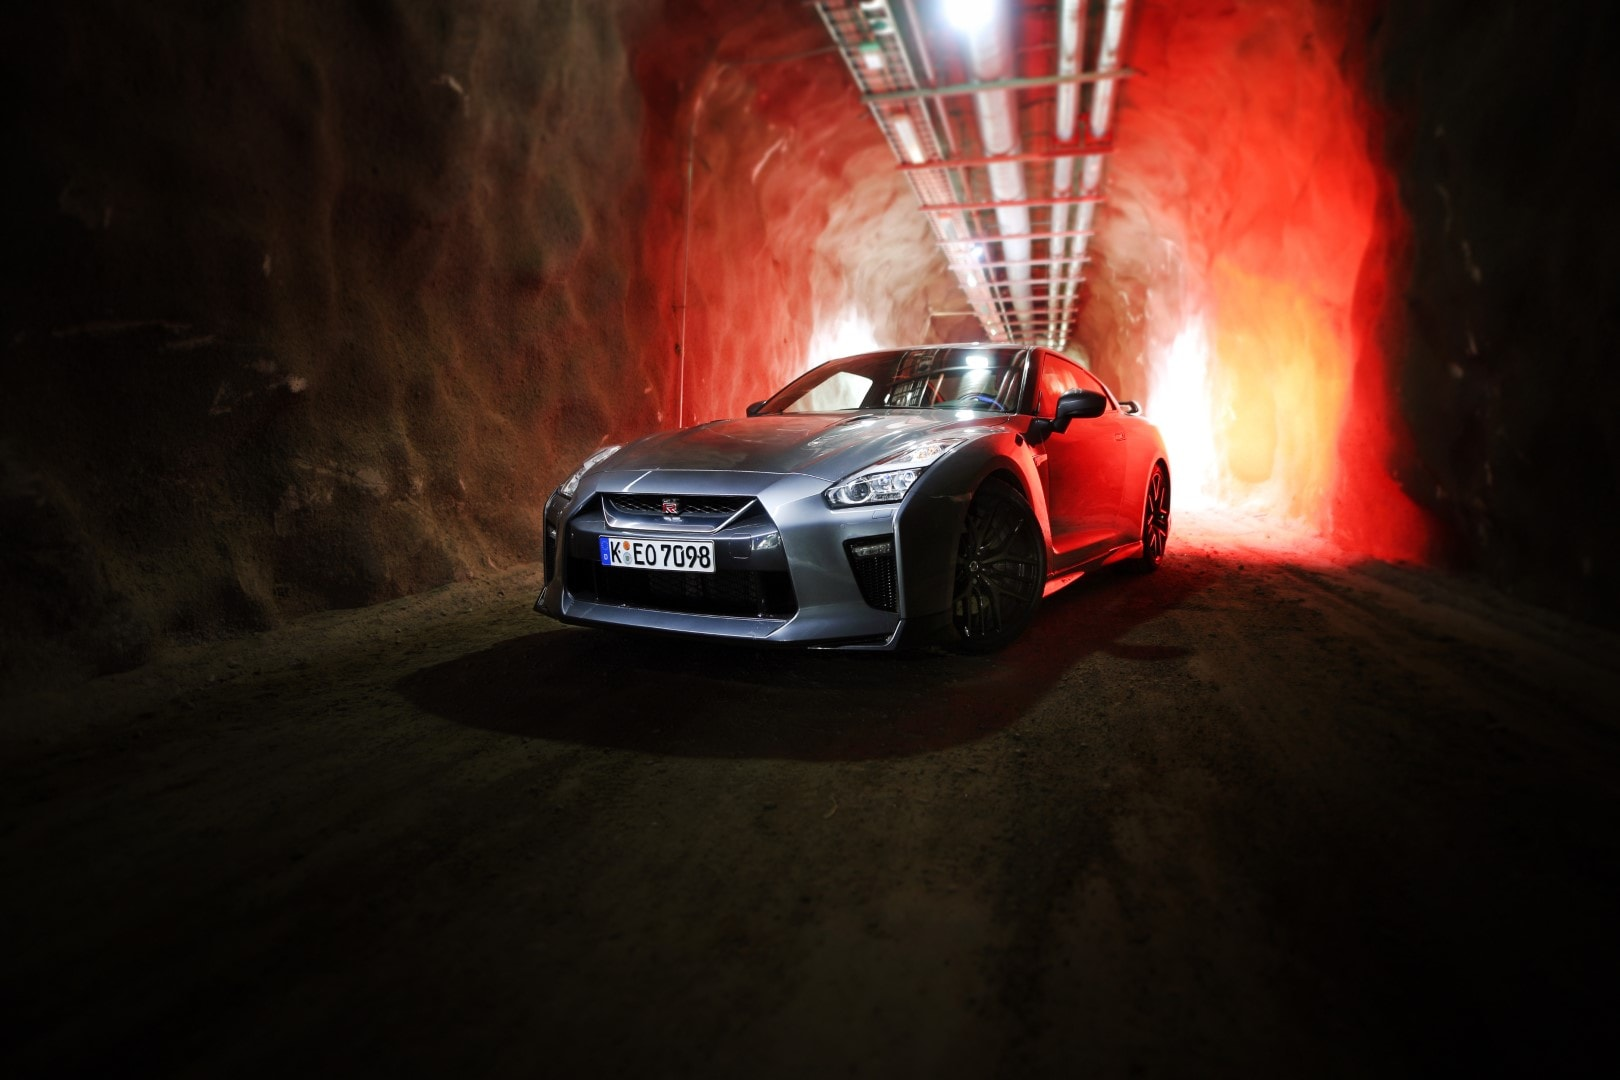 Nissan GTR picture in Santa Claus tunnel Finland Rovaniemi Giedrius Matulaitis matulaitis.lt